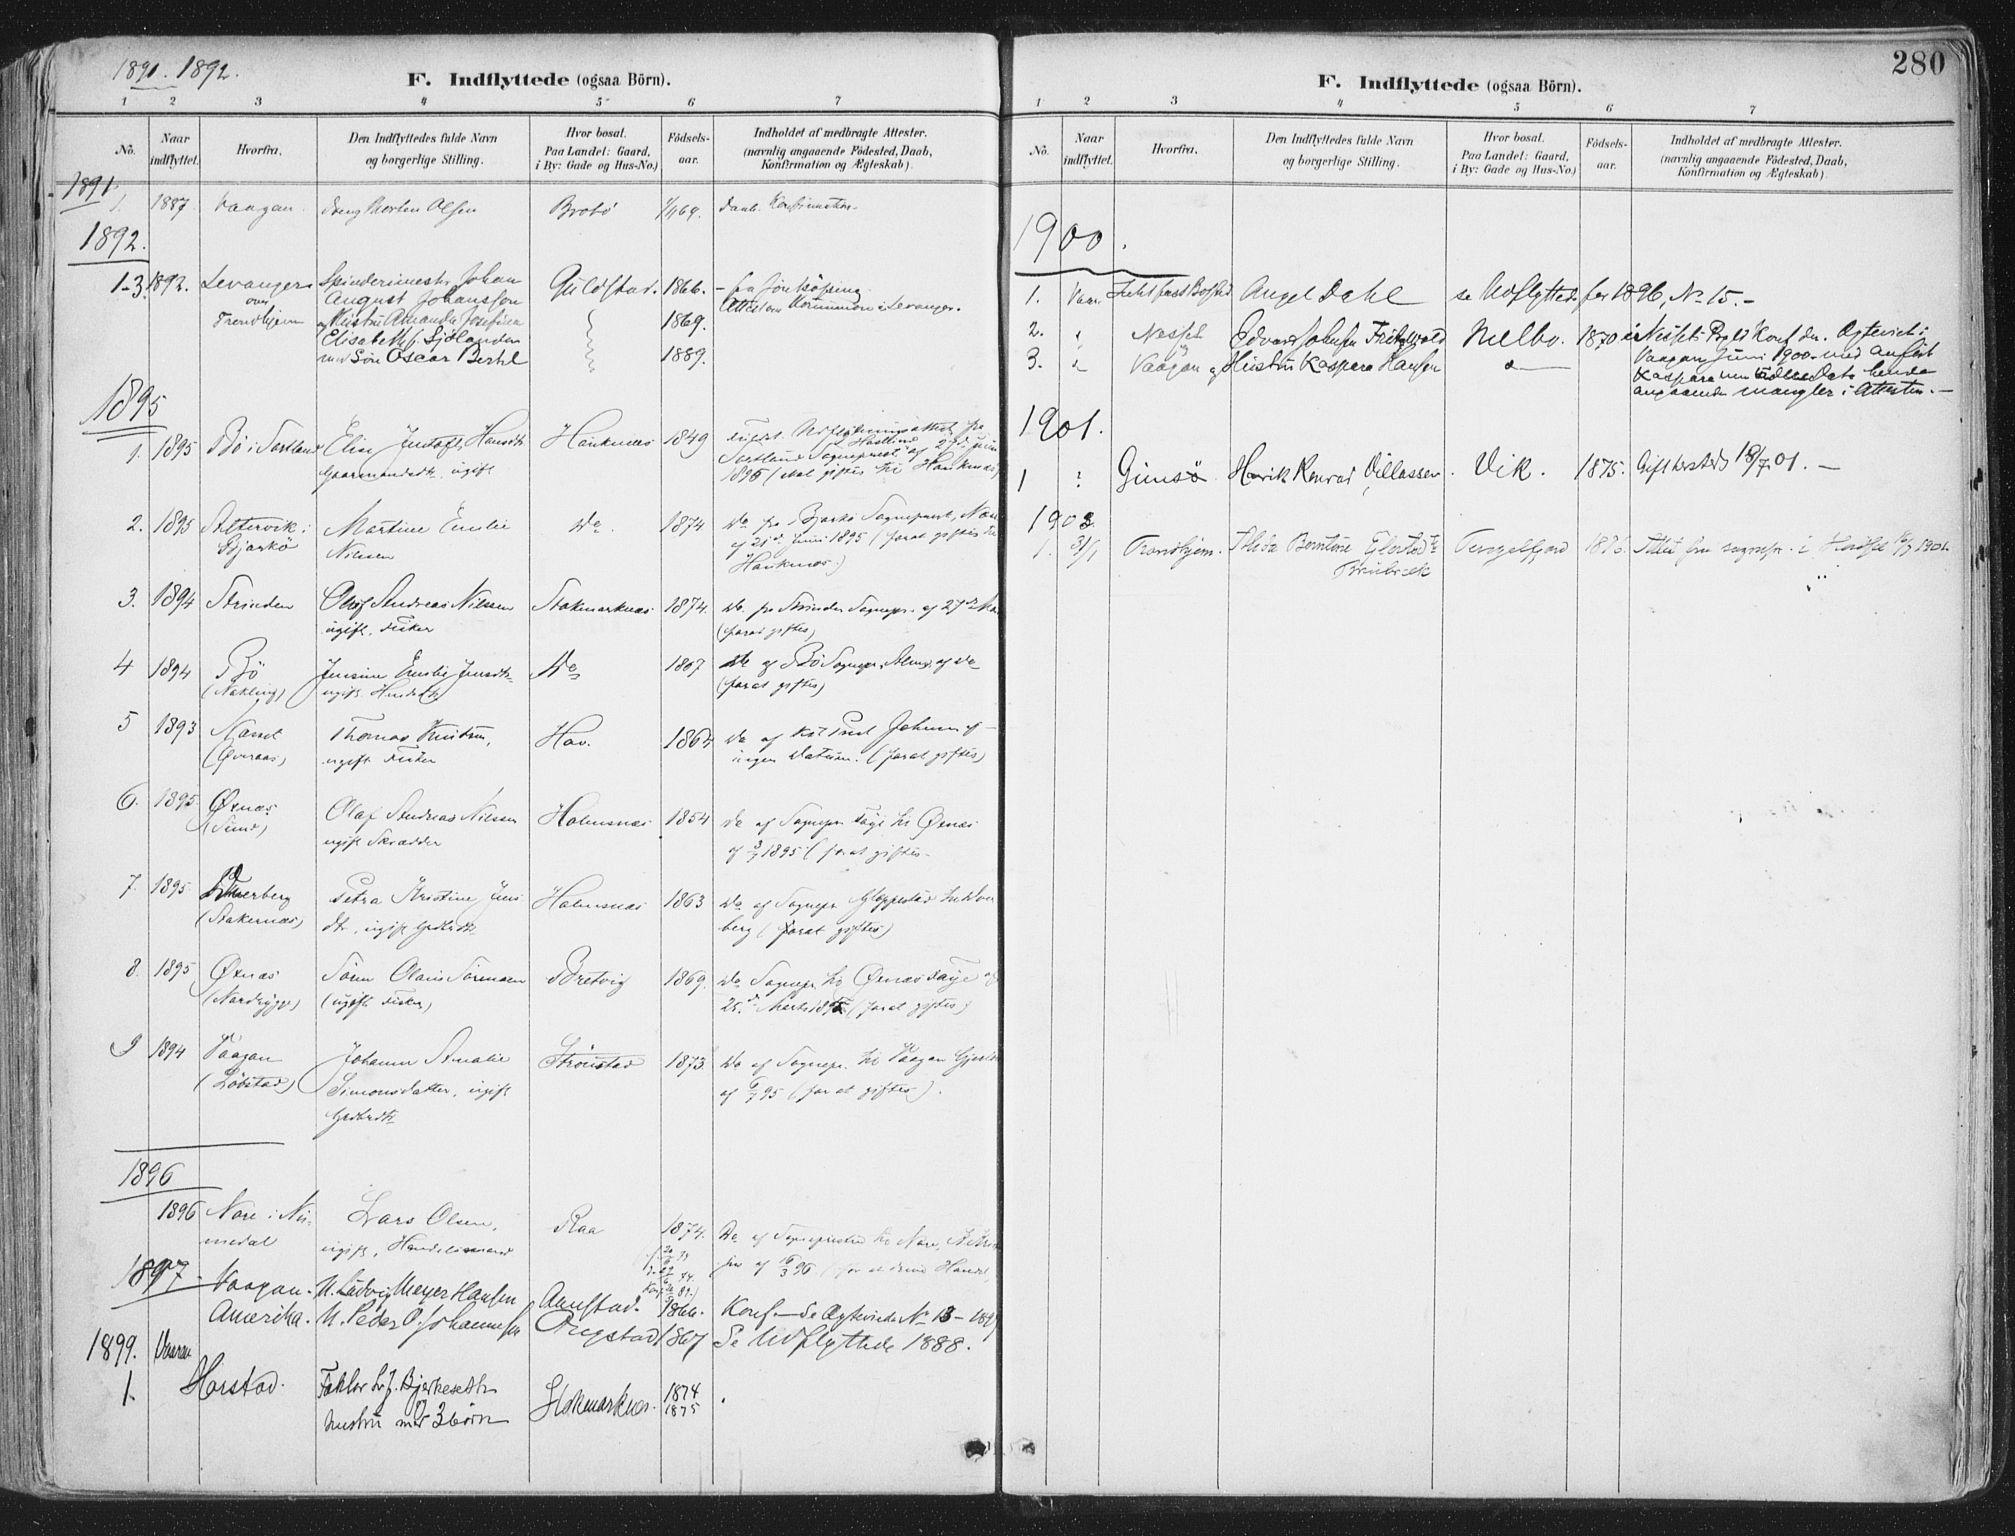 SAT, Ministerialprotokoller, klokkerbøker og fødselsregistre - Nordland, 888/L1246: Ministerialbok nr. 888A12, 1891-1903, s. 280